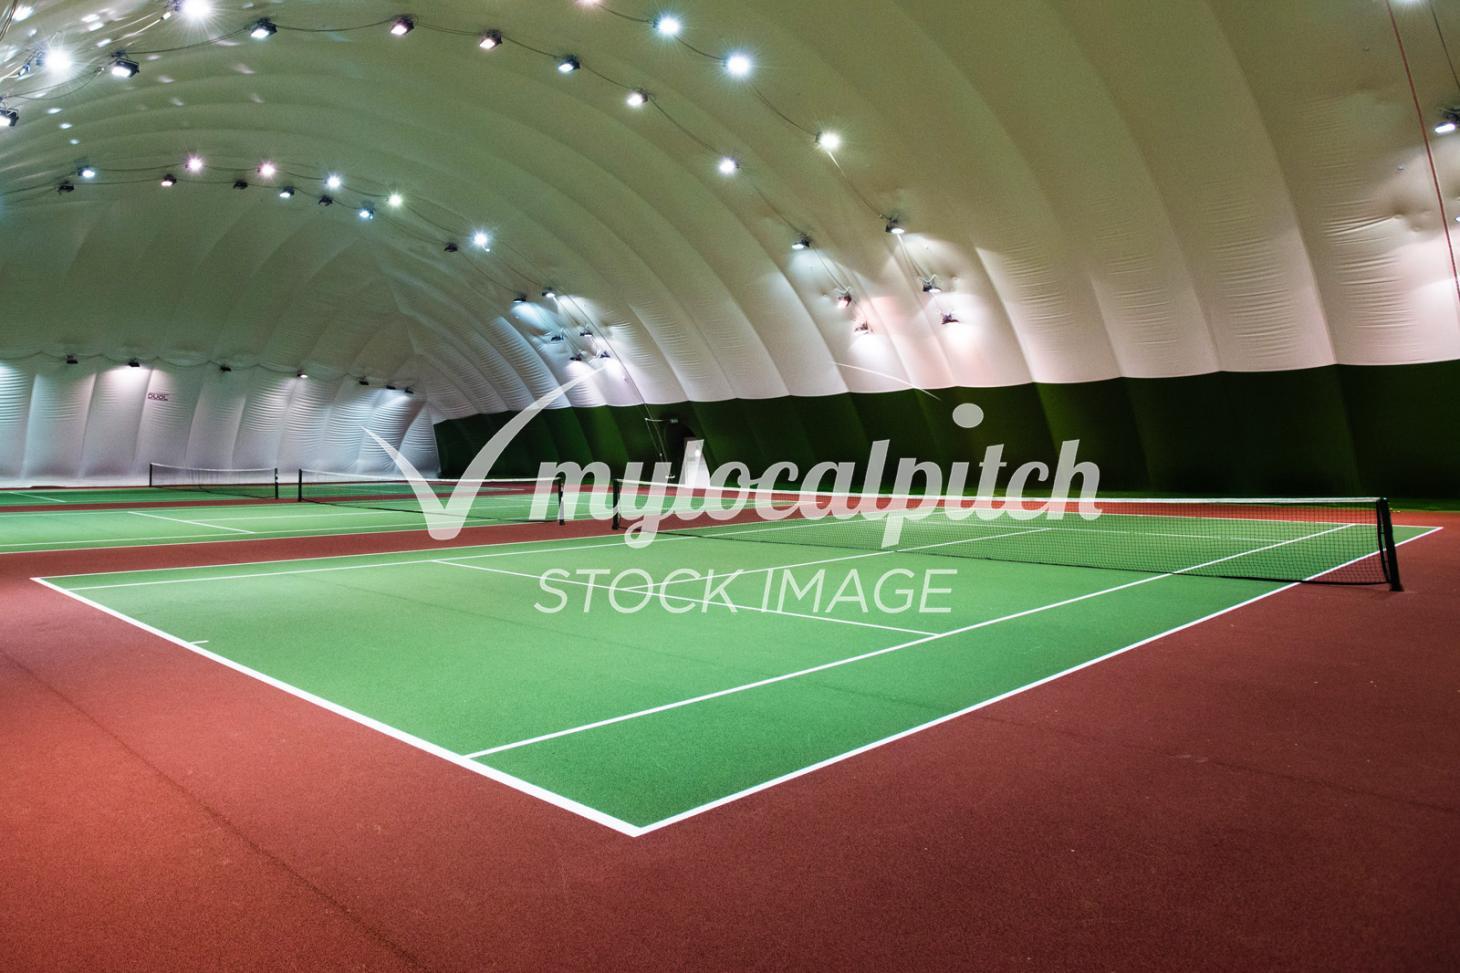 Watford Grammar School for Boys Indoor tennis court